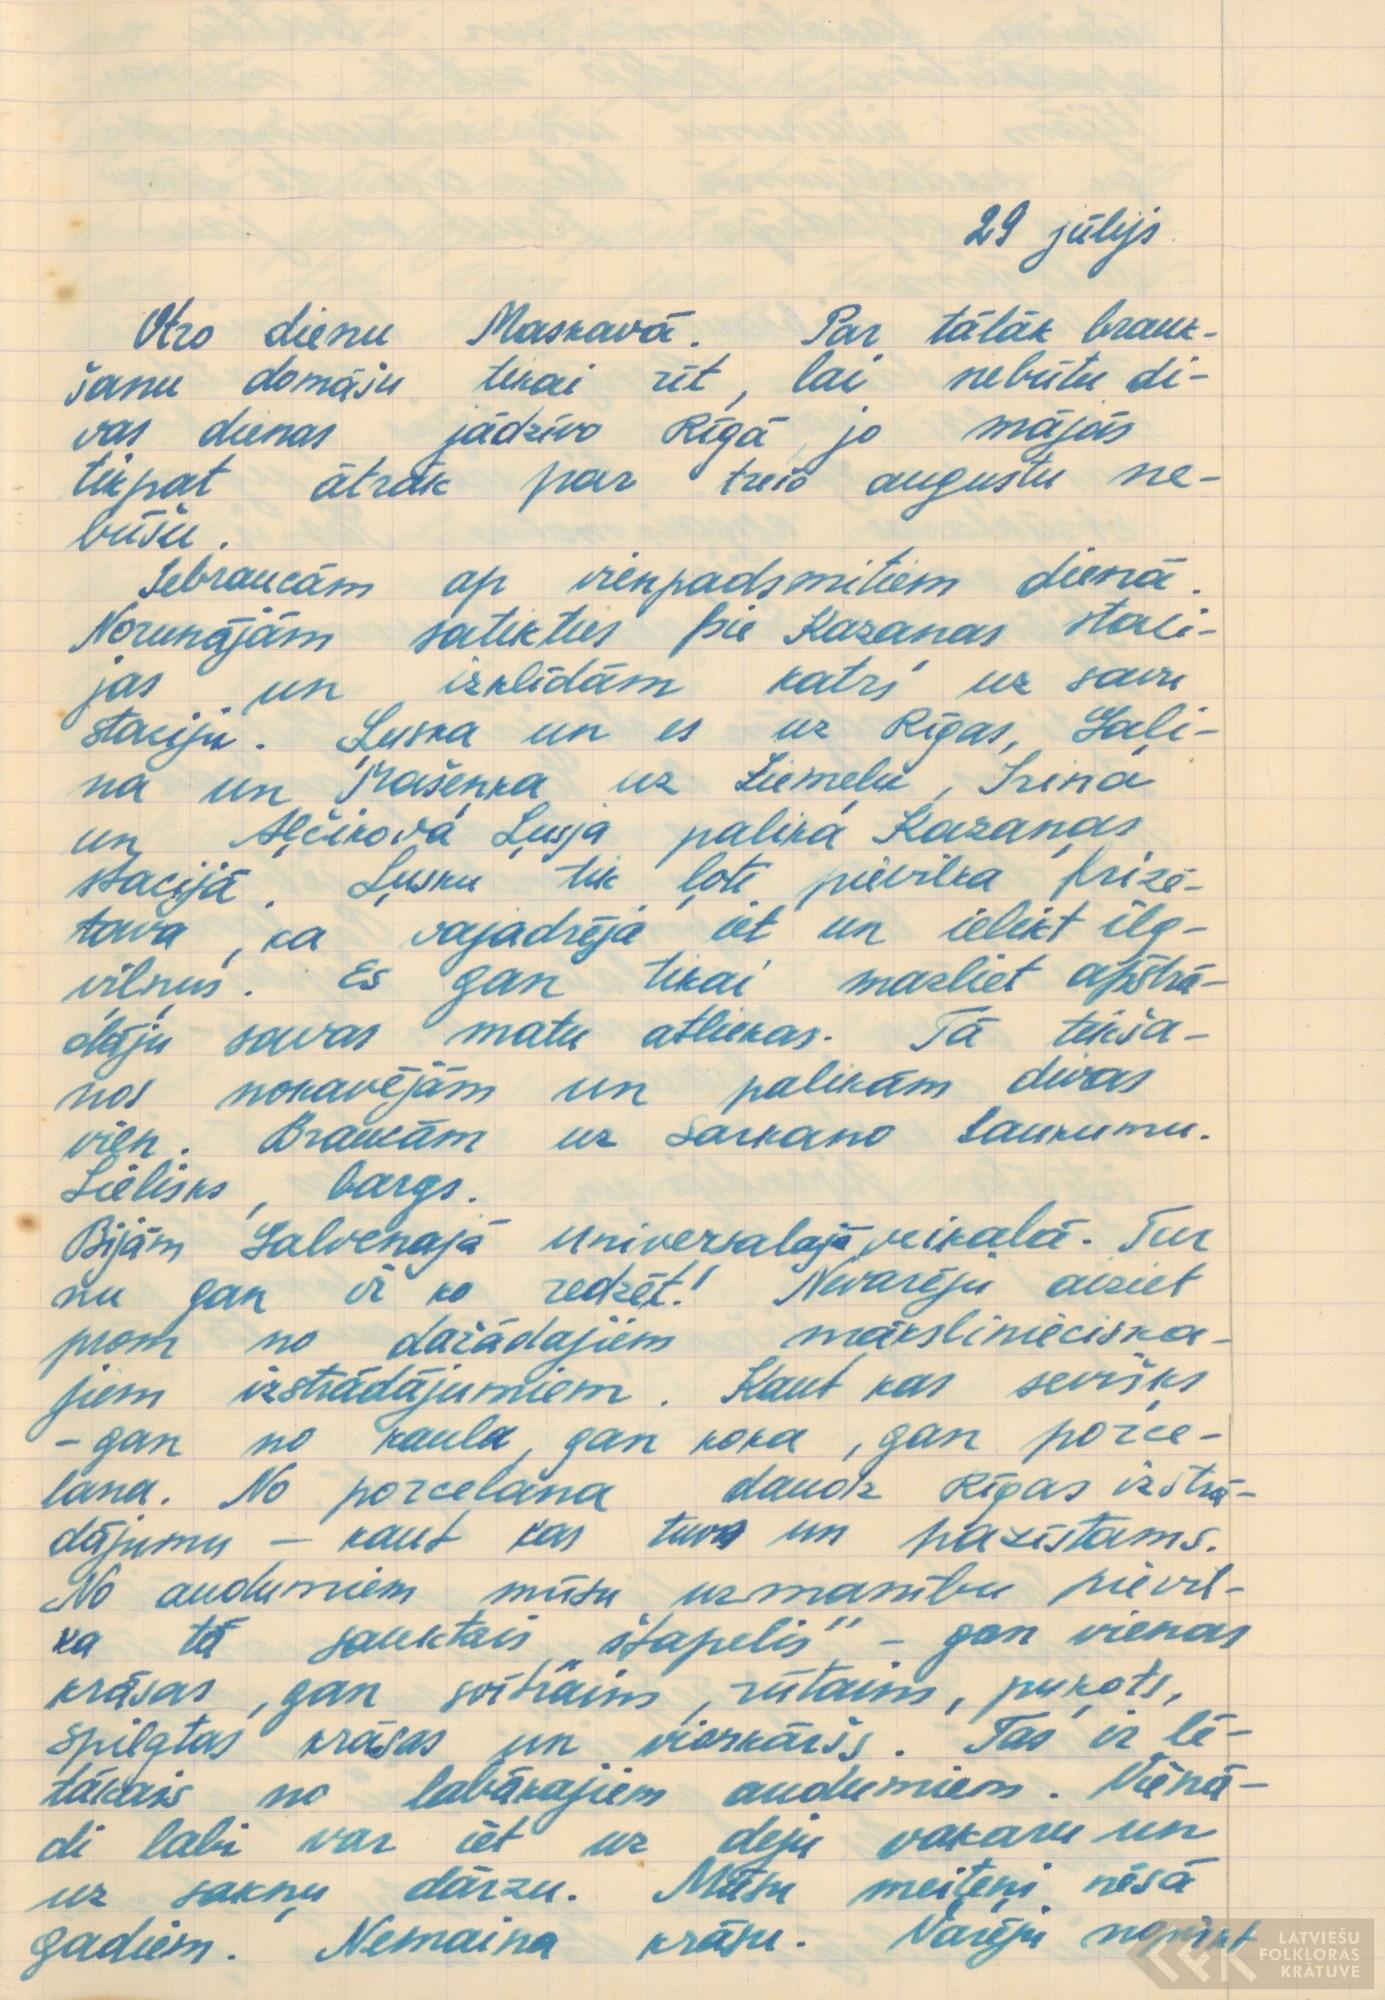 Ak161-Ligitas-Vucenas-dienasgramatas-05-0003